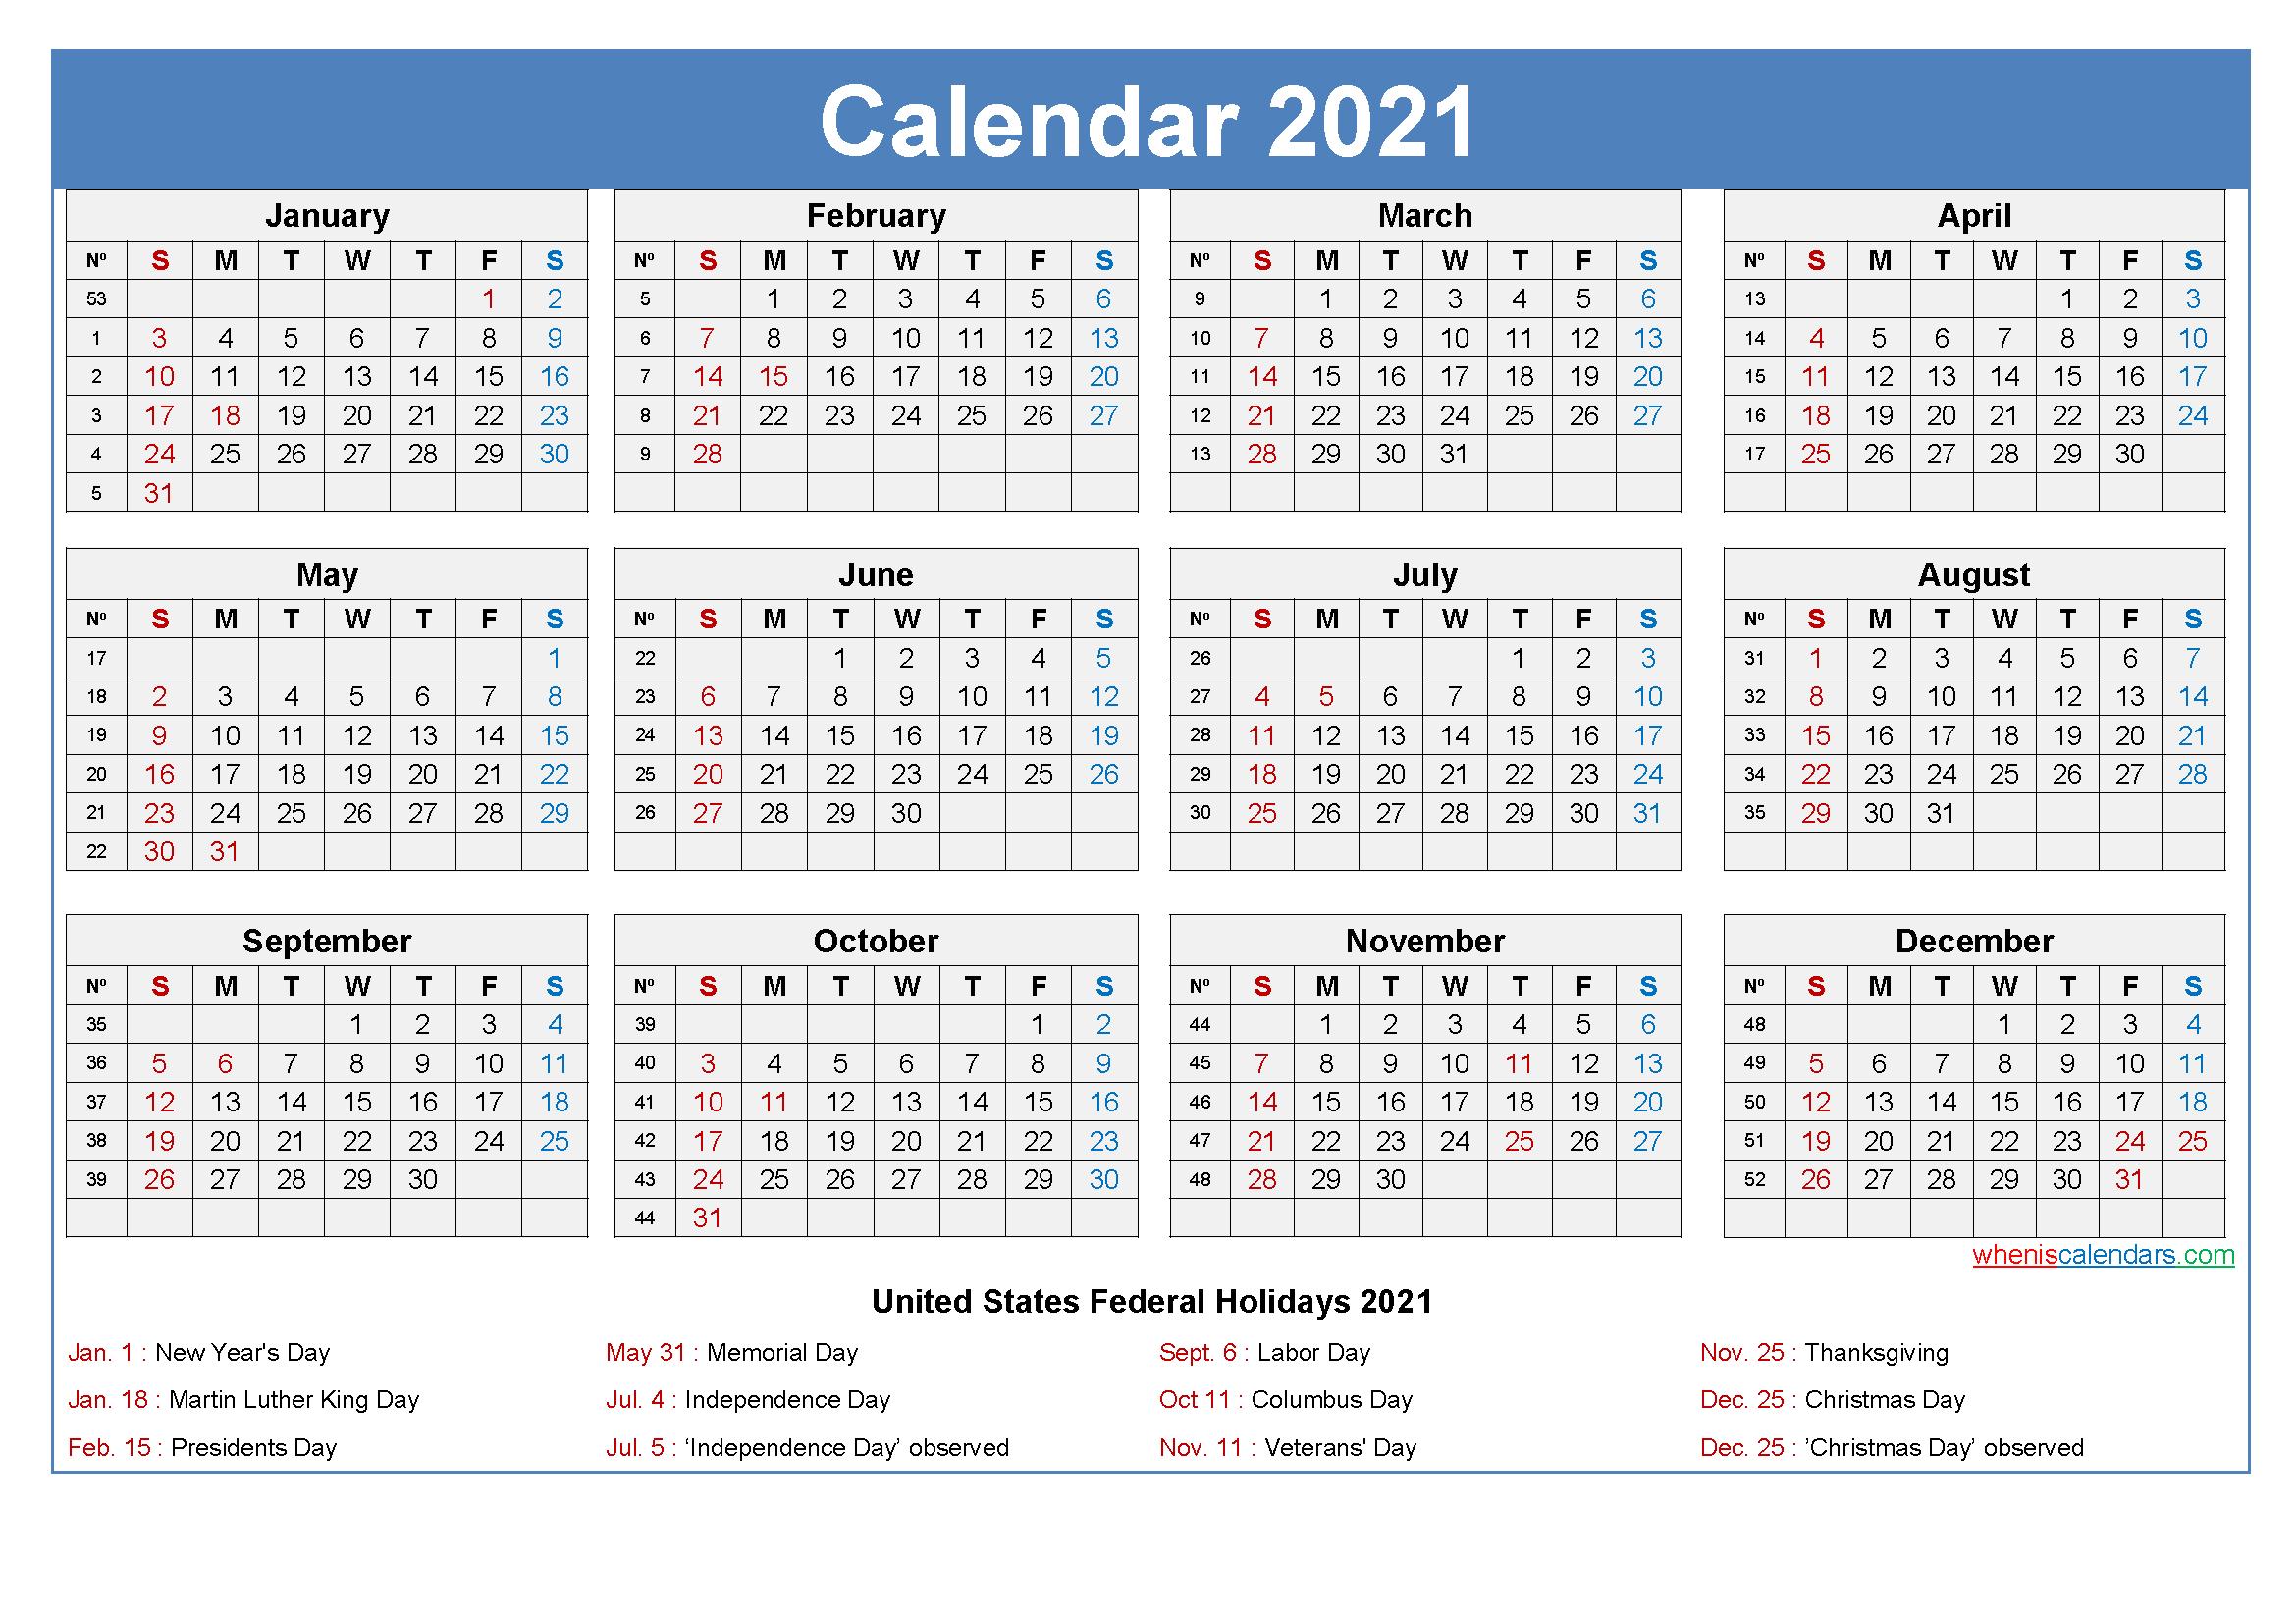 Large Desk Calendar 2021 With Holidays-Printable Calendar 2021 With Major Holidays